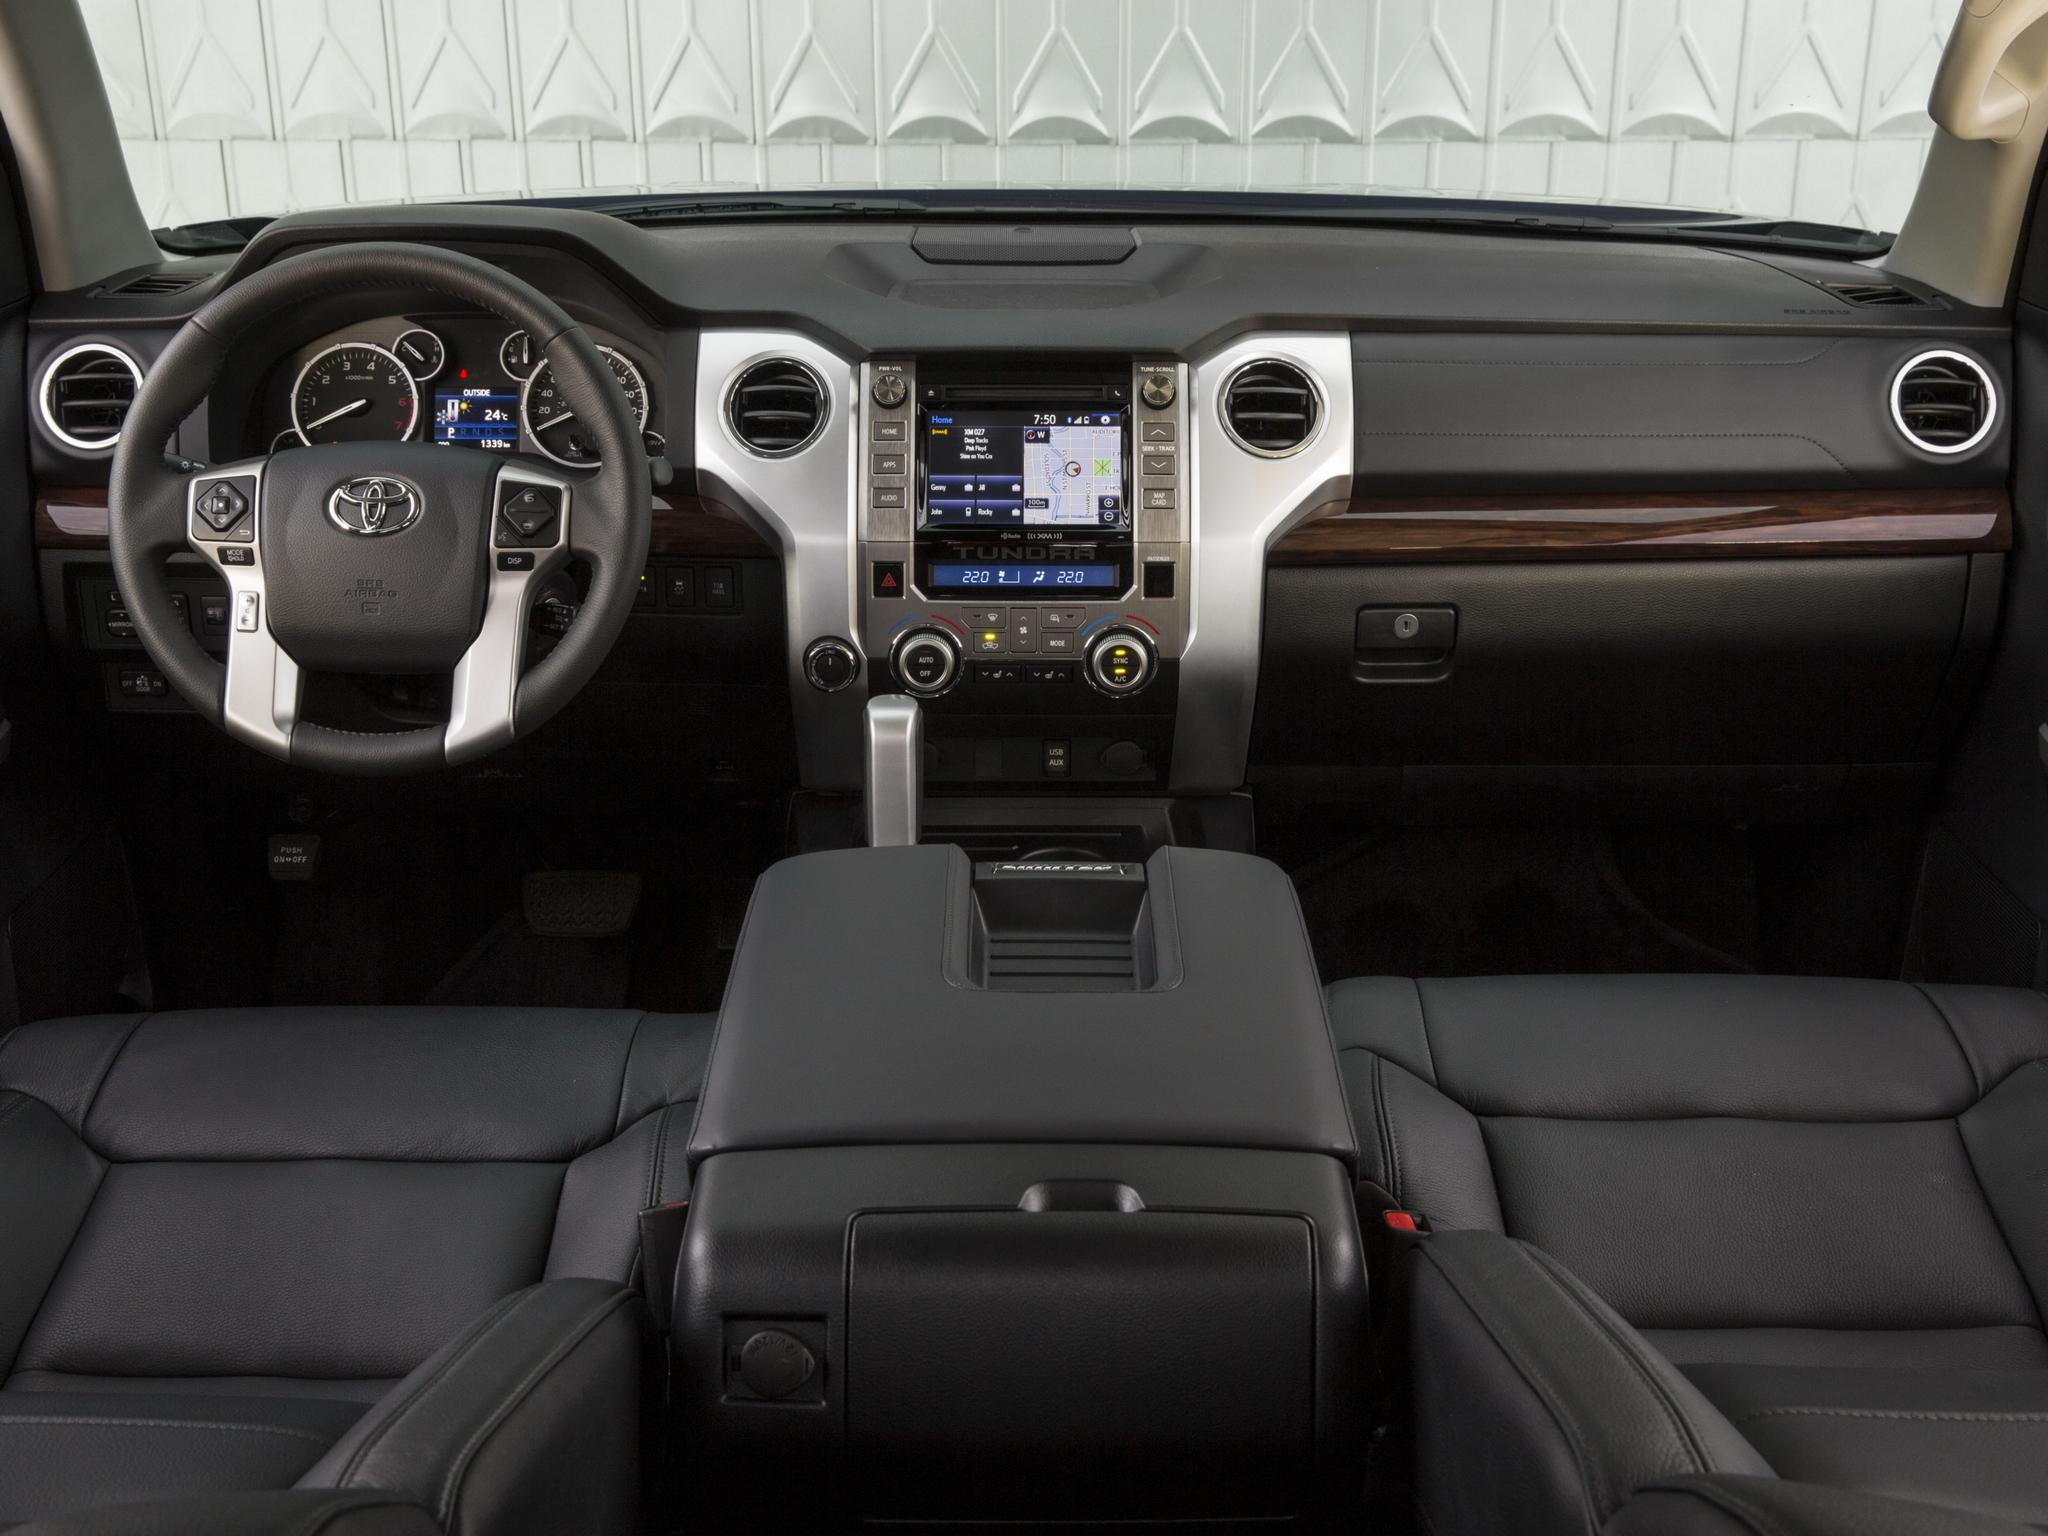 2014 Toyota Tundra Double Cab Limited pickup interior f ...